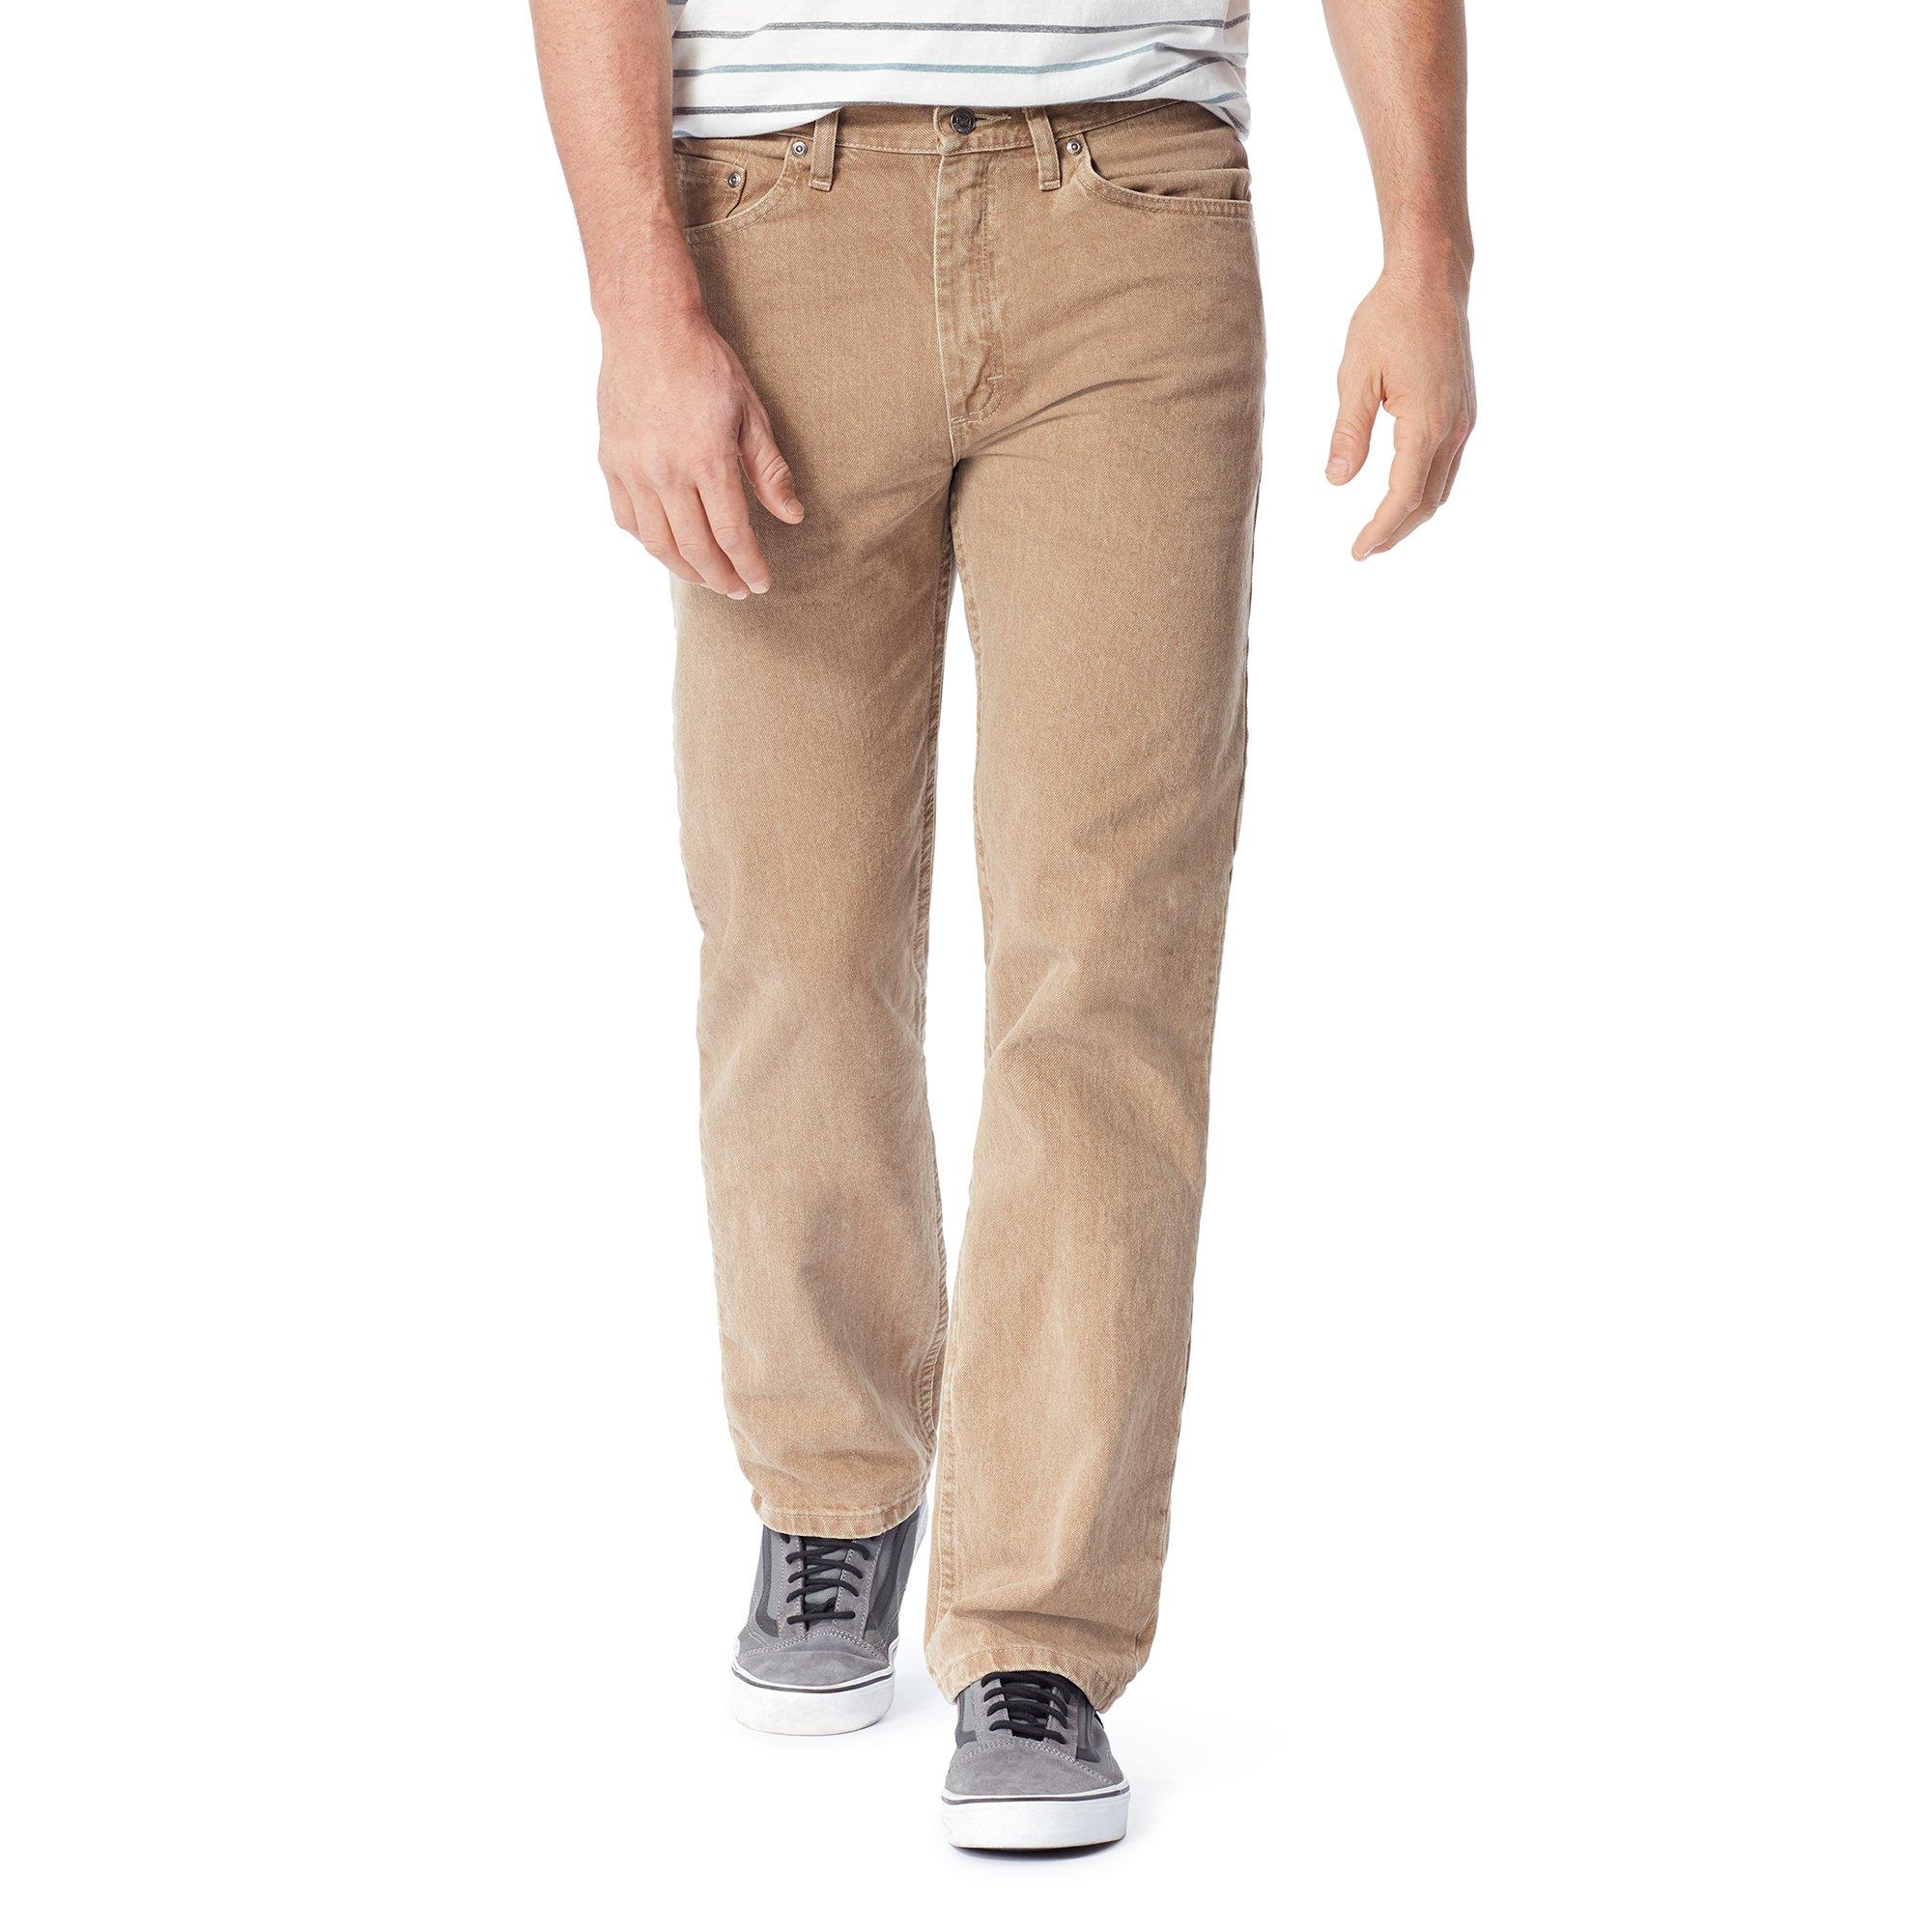 Wrangler Authentics Men's Classic 5-Pocket Regular Fit Jean,Khaki,36x32